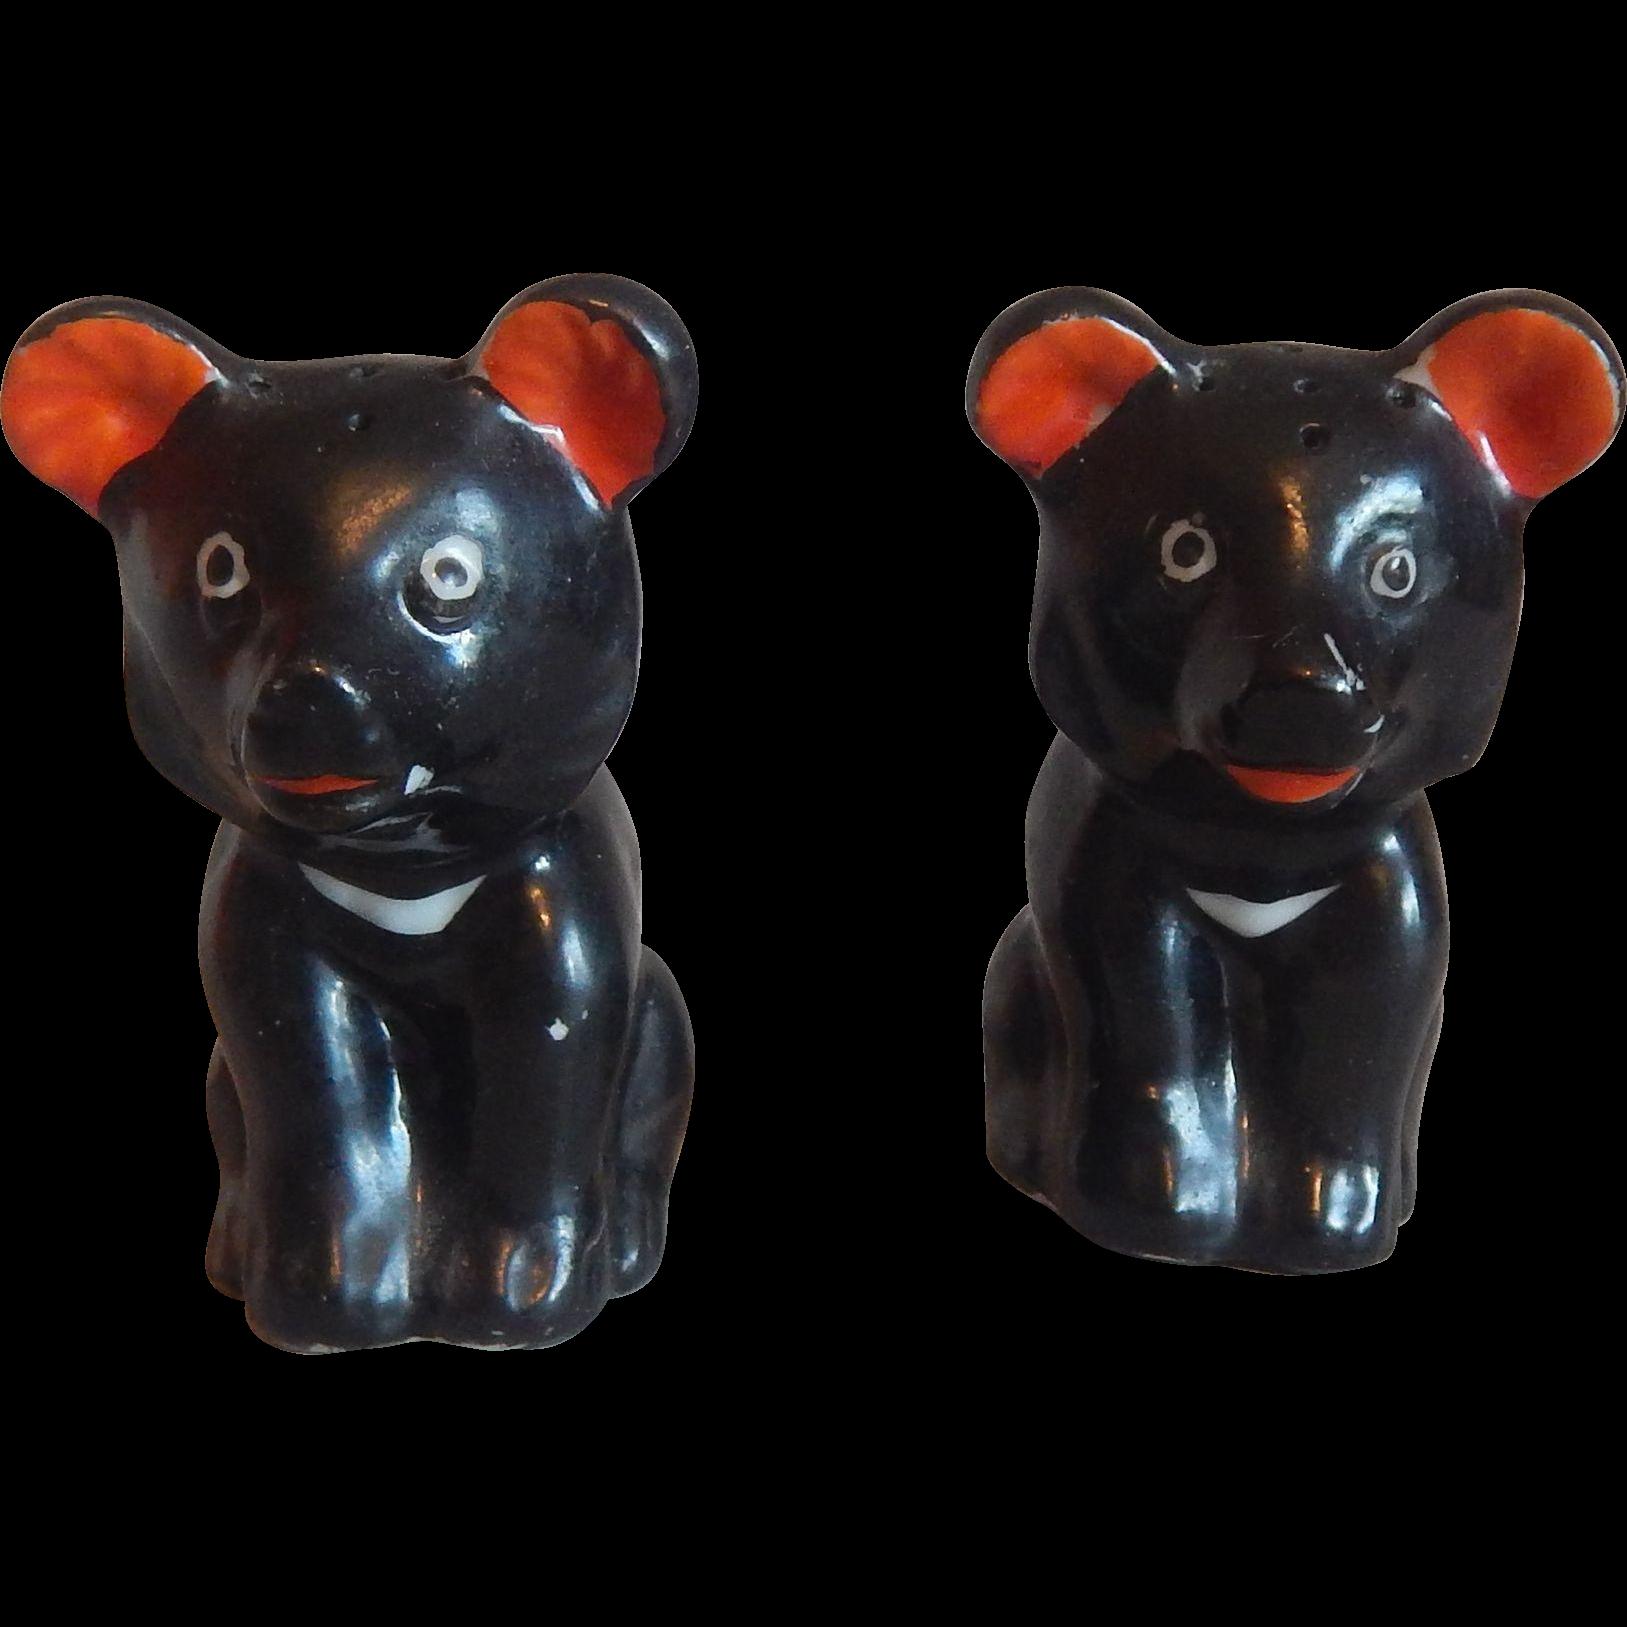 Black Bear Salt and Pepper Shakers